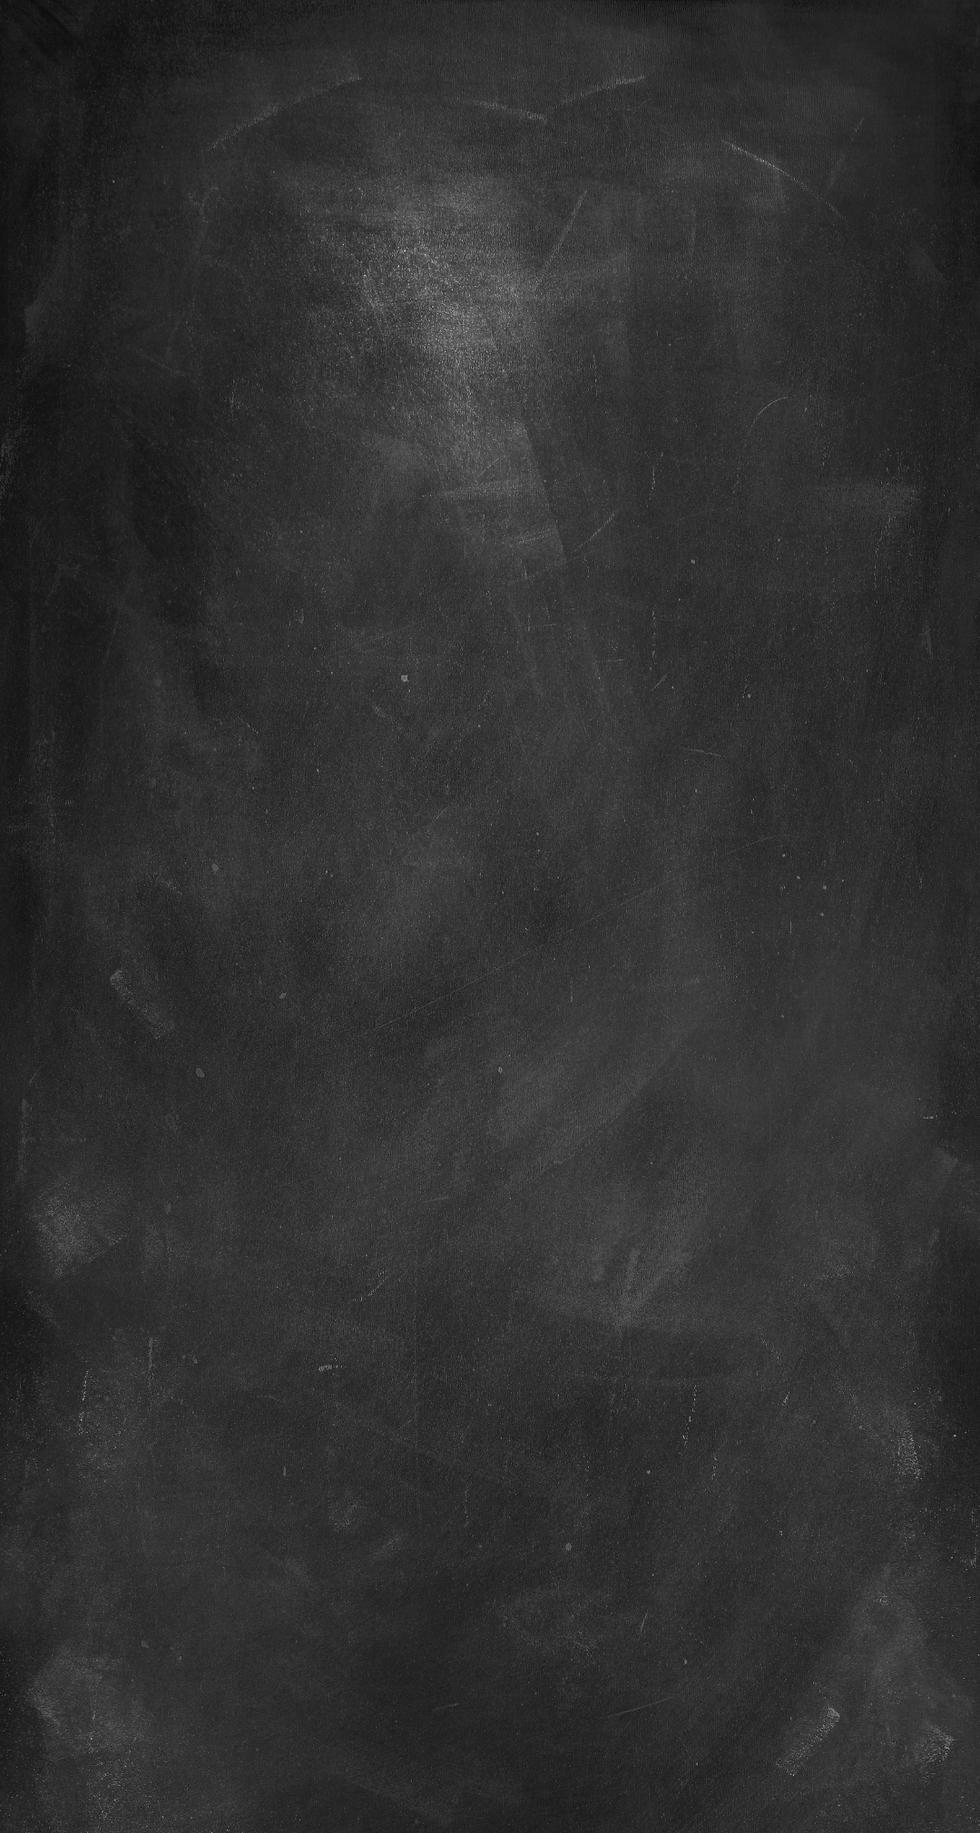 sylvie müller blackboard 2.png